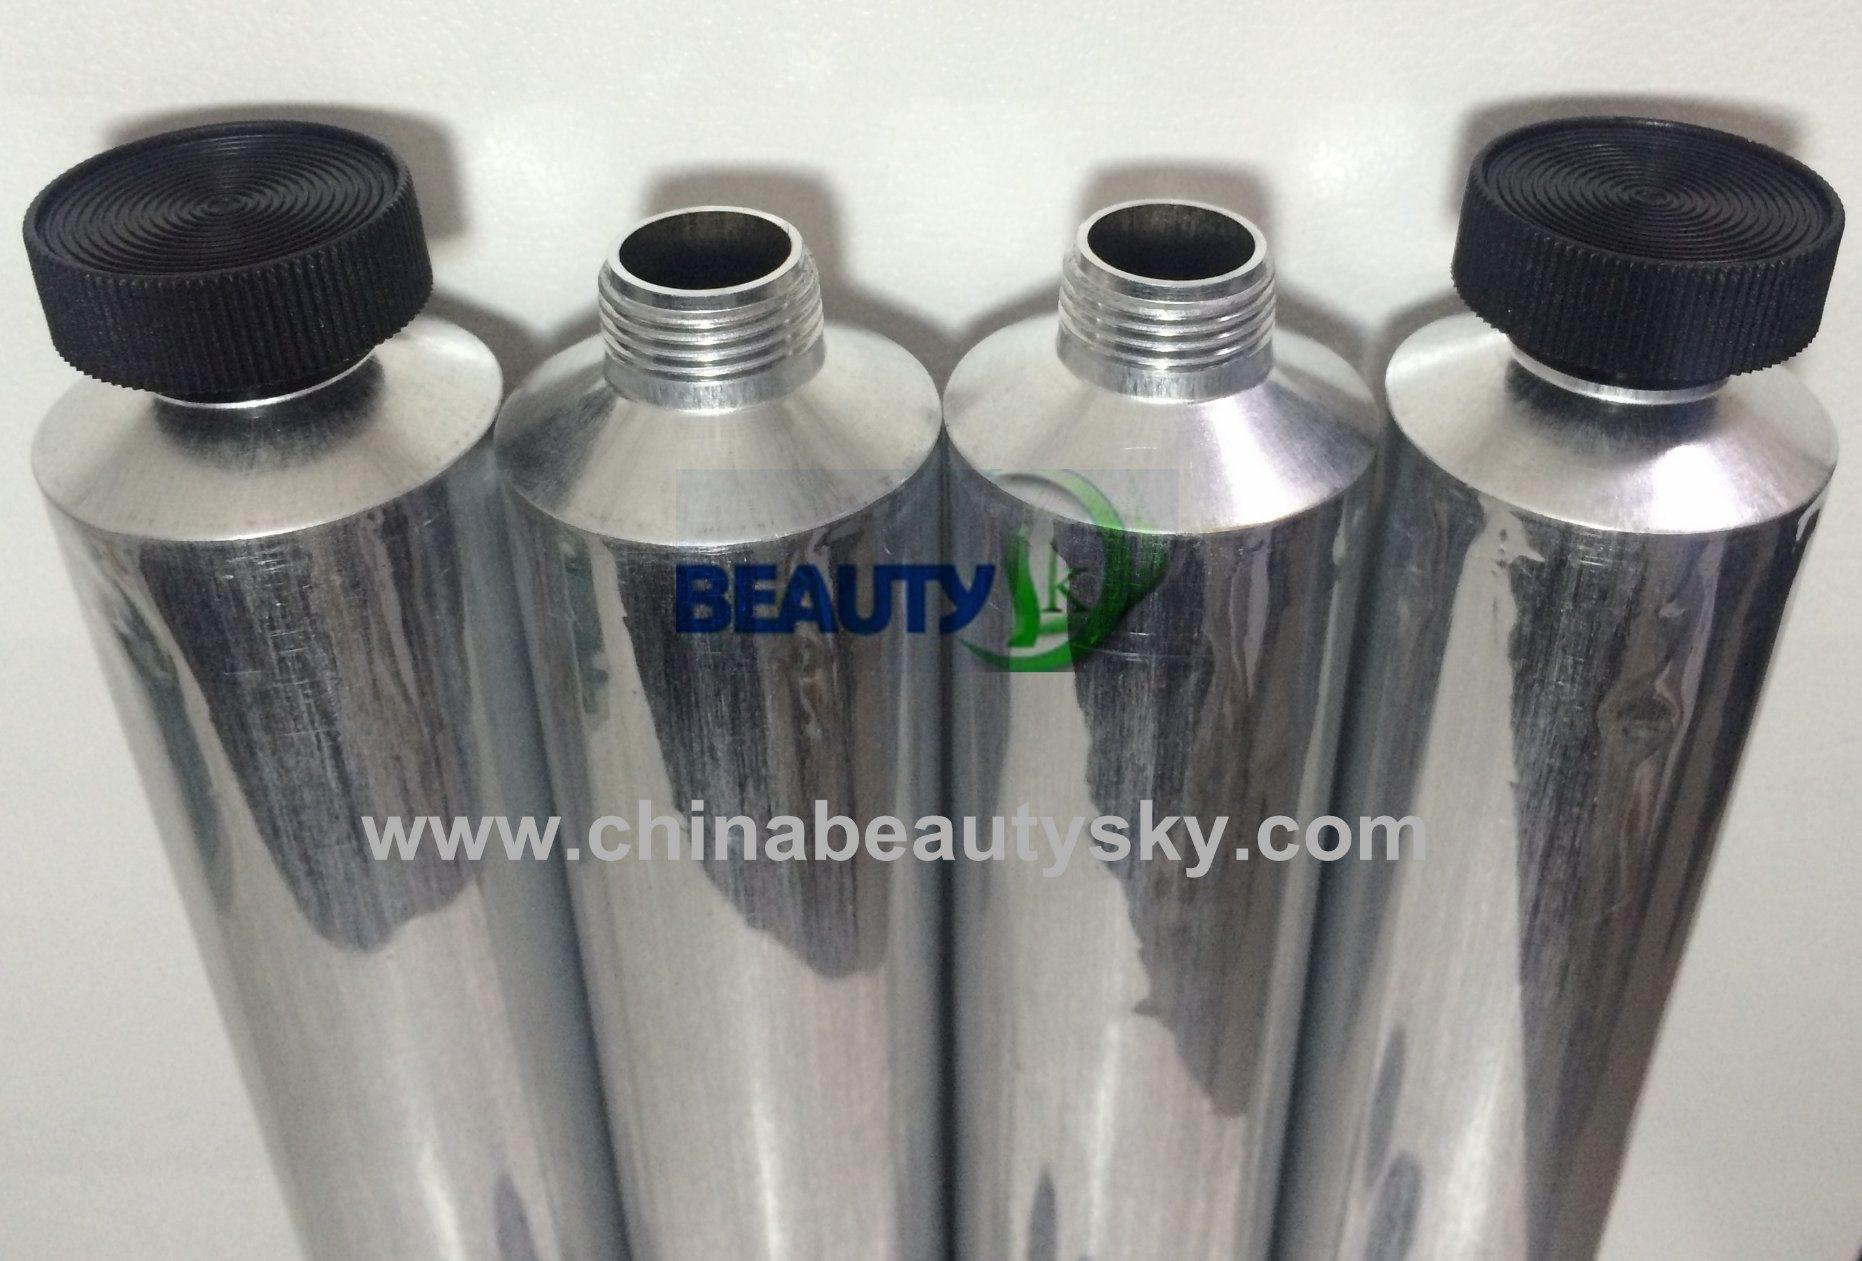 Printed RTV Silicone Sealants Adhesive Glue Packaging Aluminum Packaging Tubes